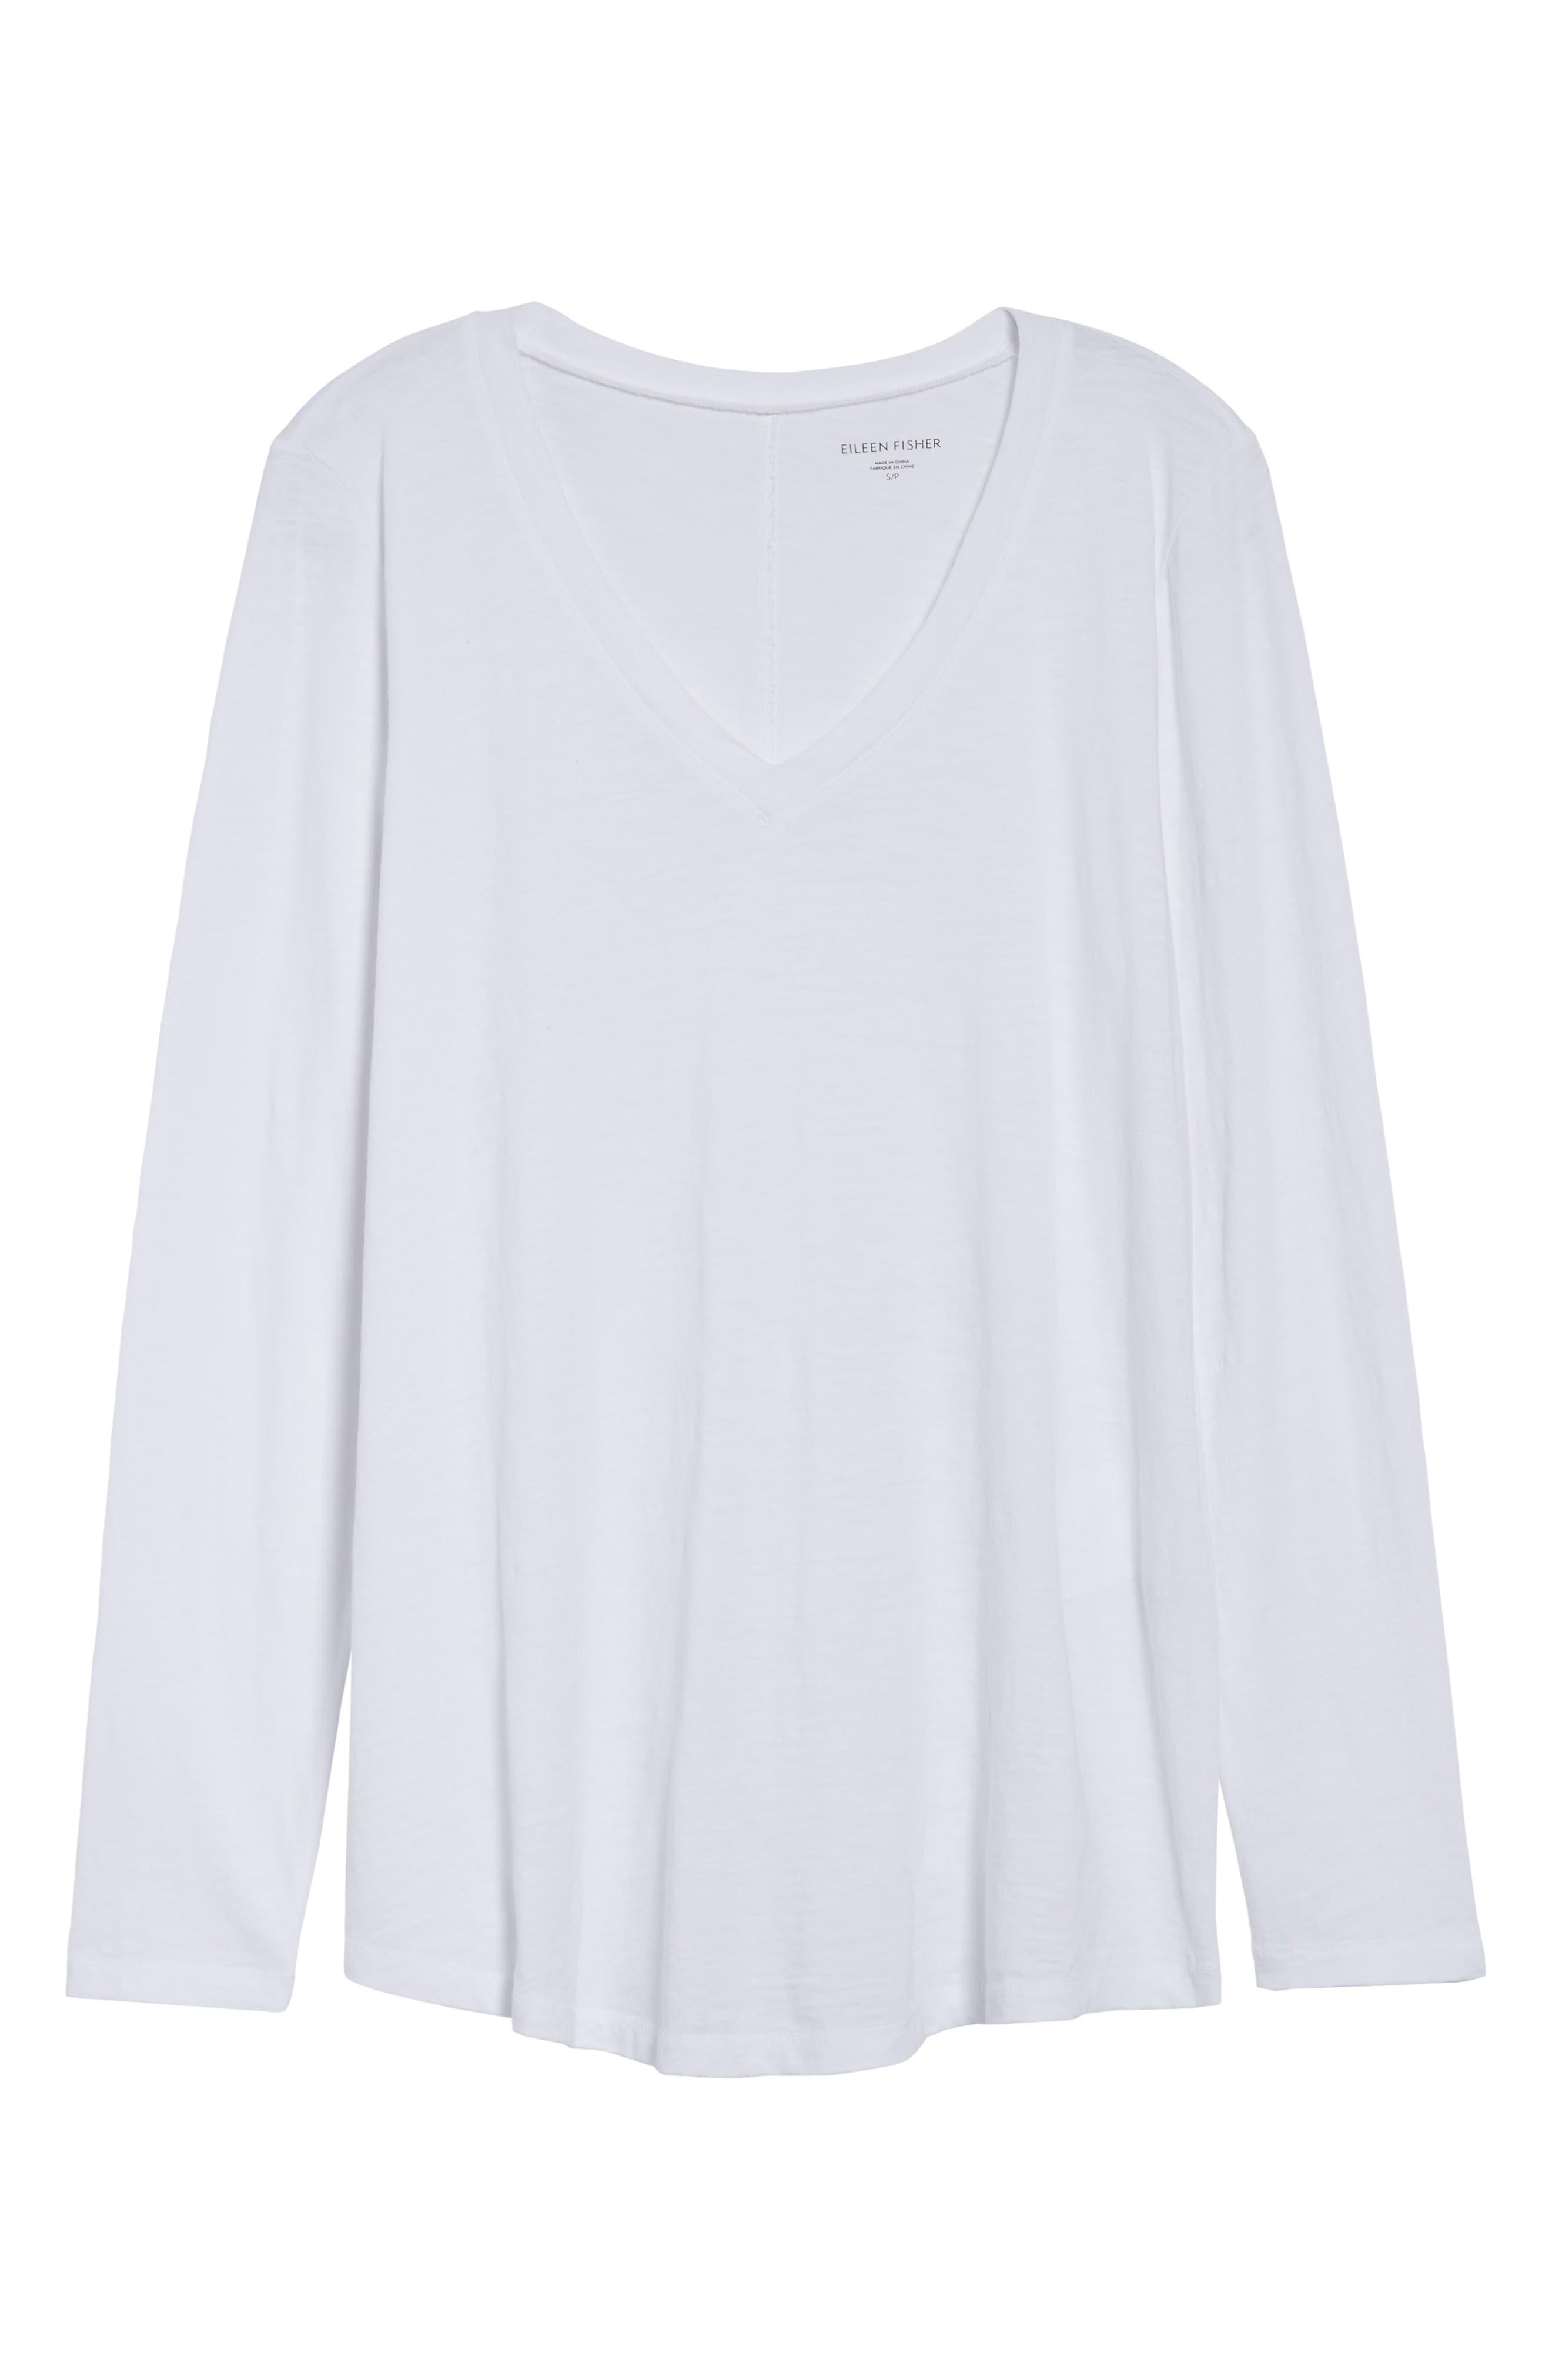 Organic Cotton V-Neck Tee,                             Alternate thumbnail 6, color,                             White